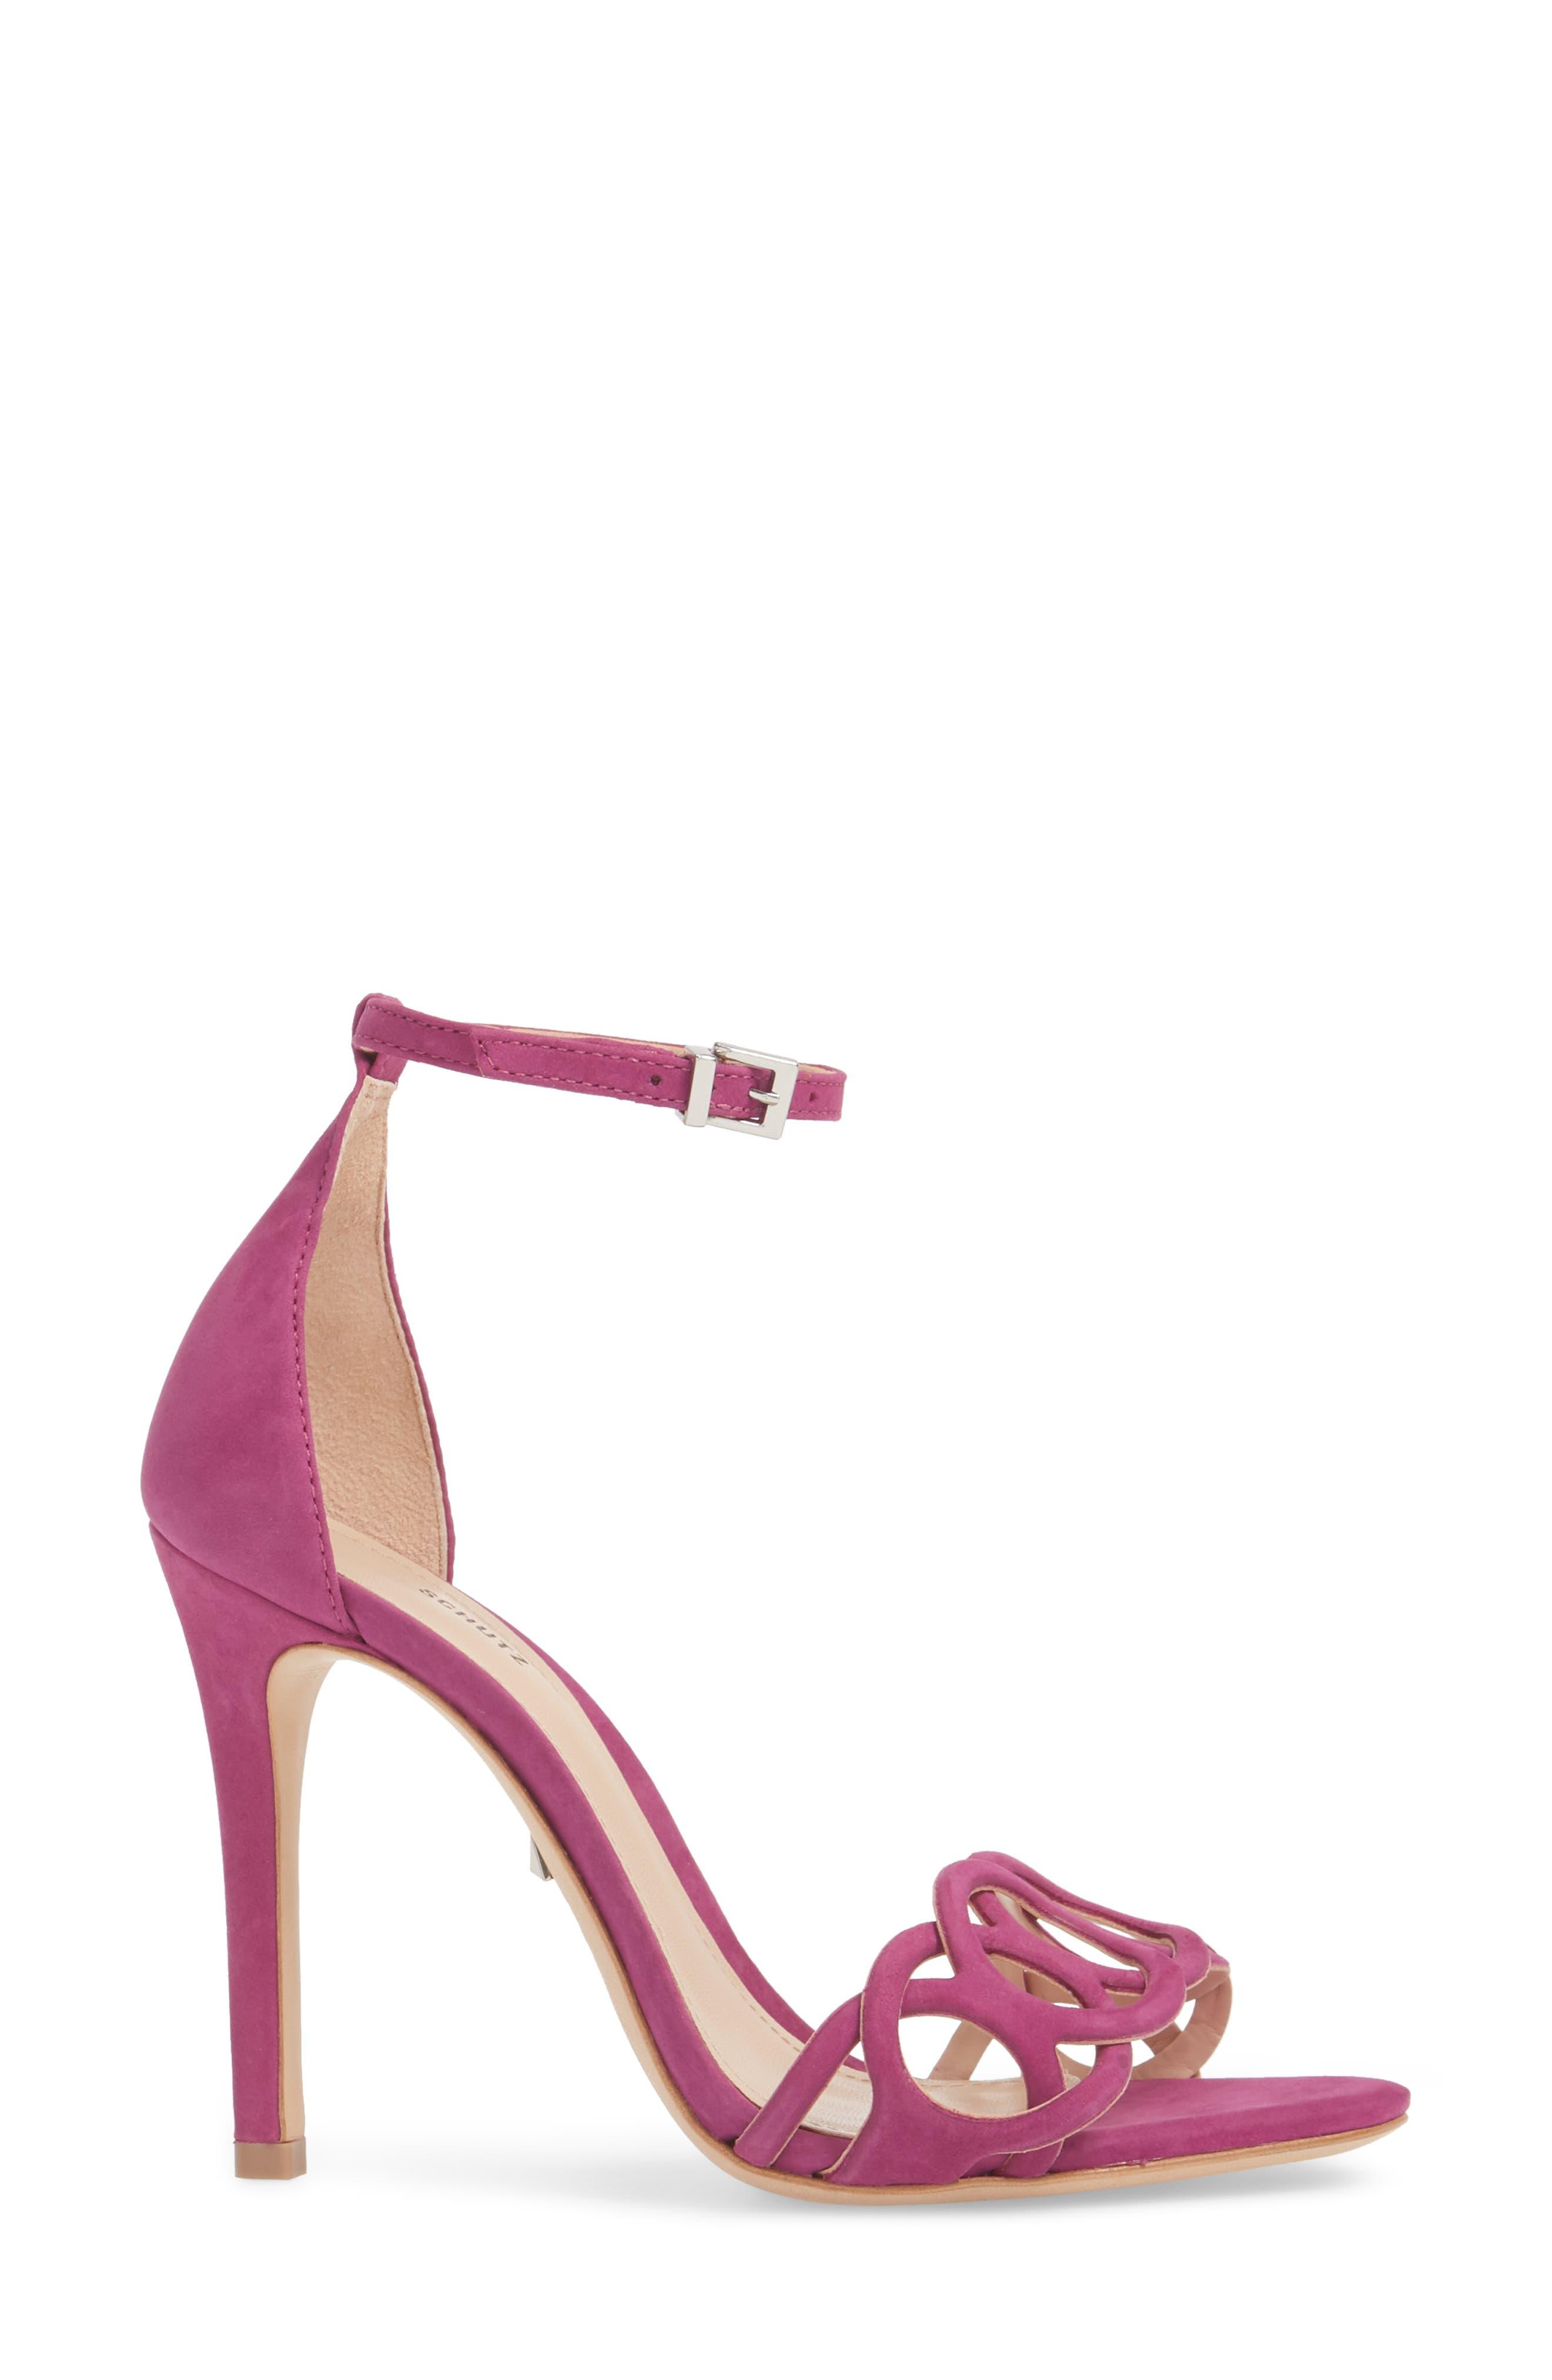 Sthefany Ankle Strap Sandal,                             Alternate thumbnail 3, color,                             Grape Leather